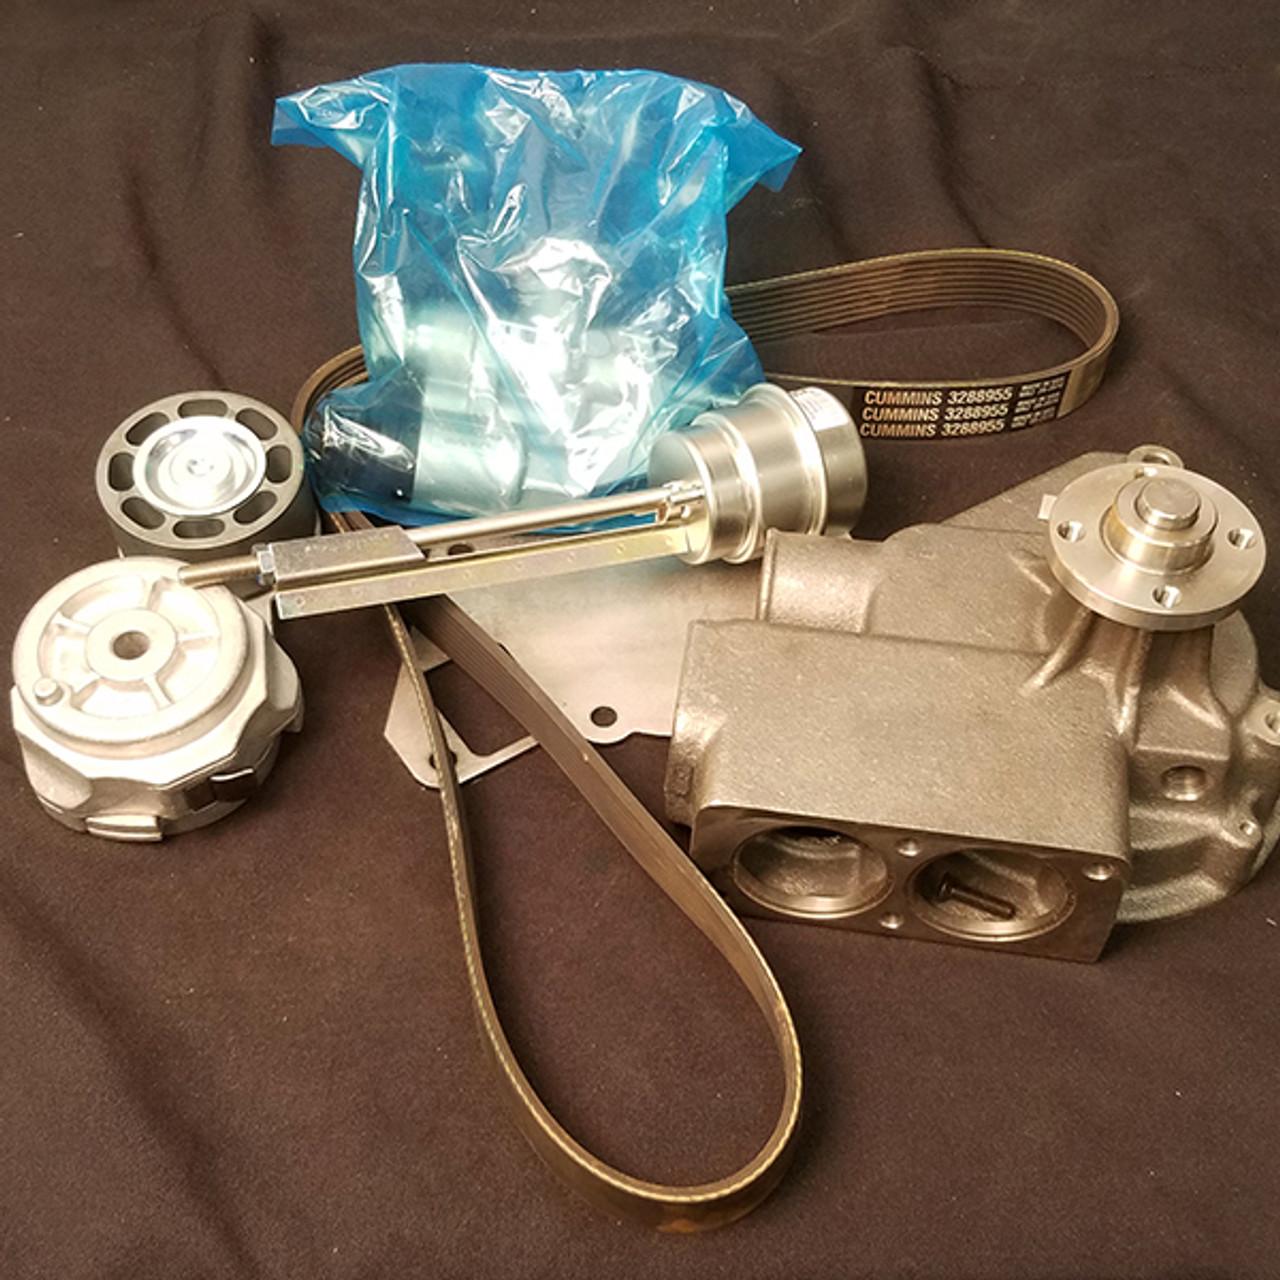 5298734 | Cummins® OEM Wiring Harness Repair Kit | The Modern ShopThe Modern Shop - Modern Group